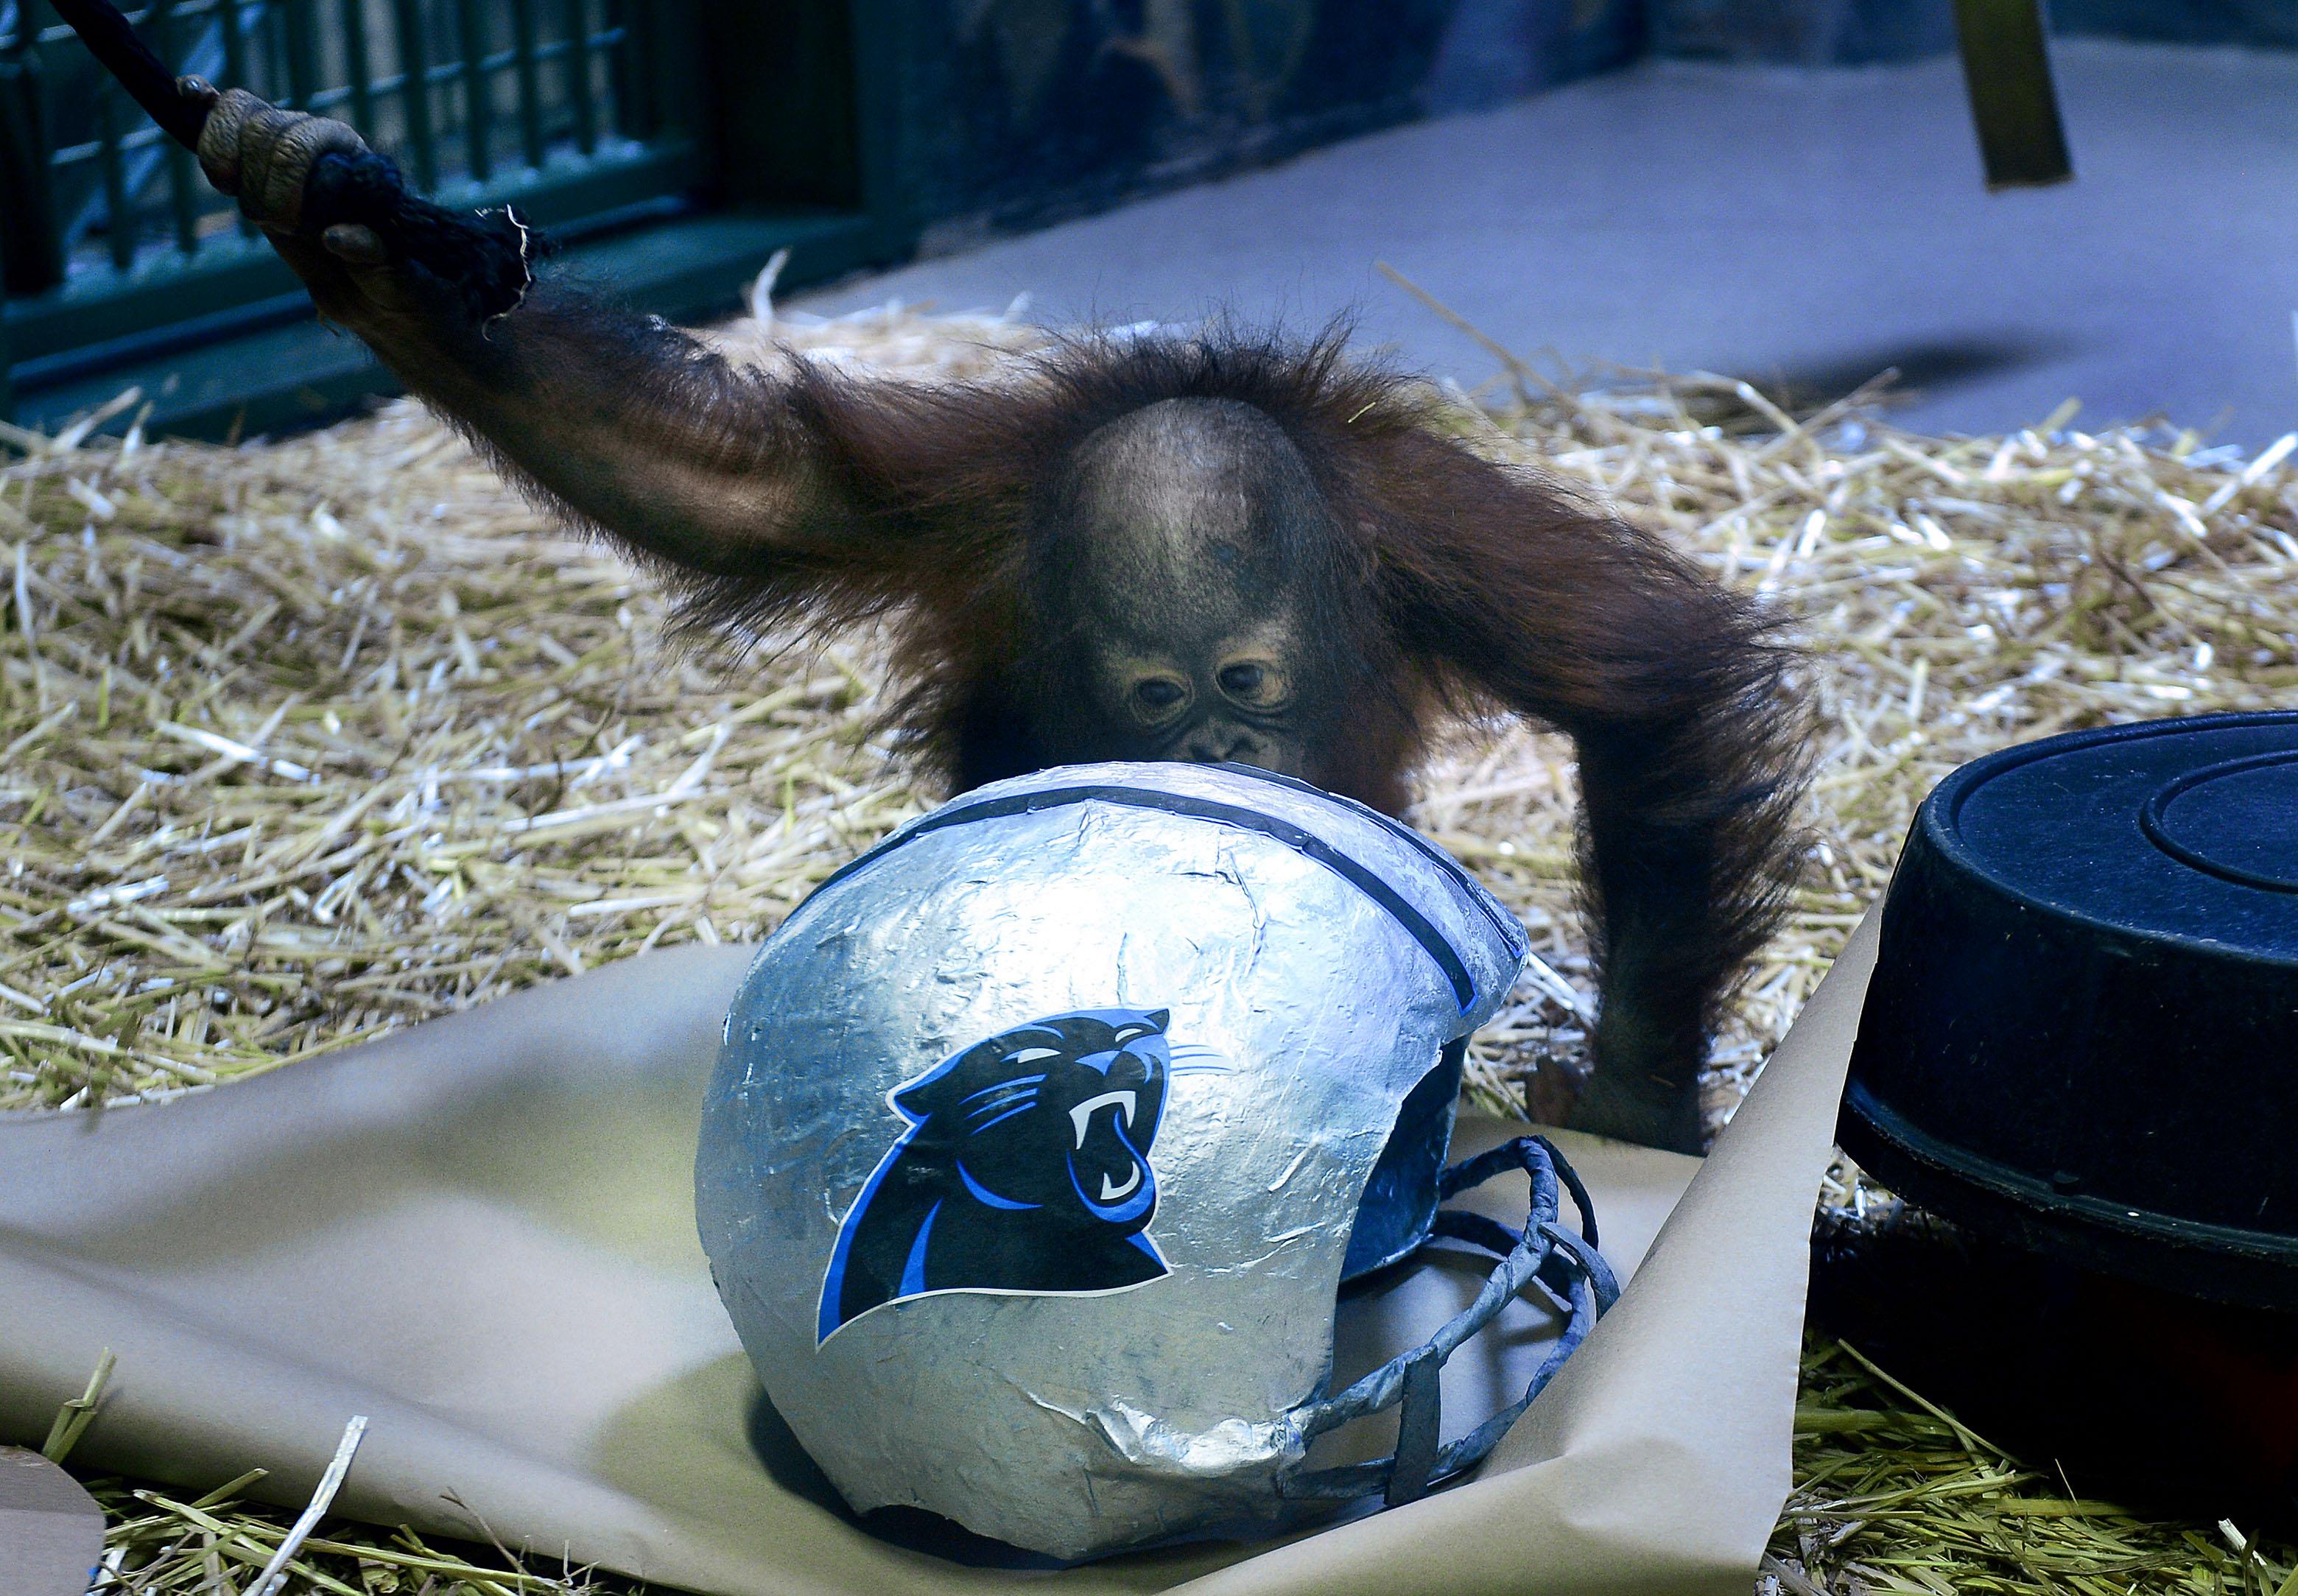 Tuah, an Orangutan at Utah's Hogle Zoo, picks the Carolina Panthers over the Denver Broncos as winners of Sunday's Super Bowl, Thursday, Feb. 4, 2016, in Salt Lake City.